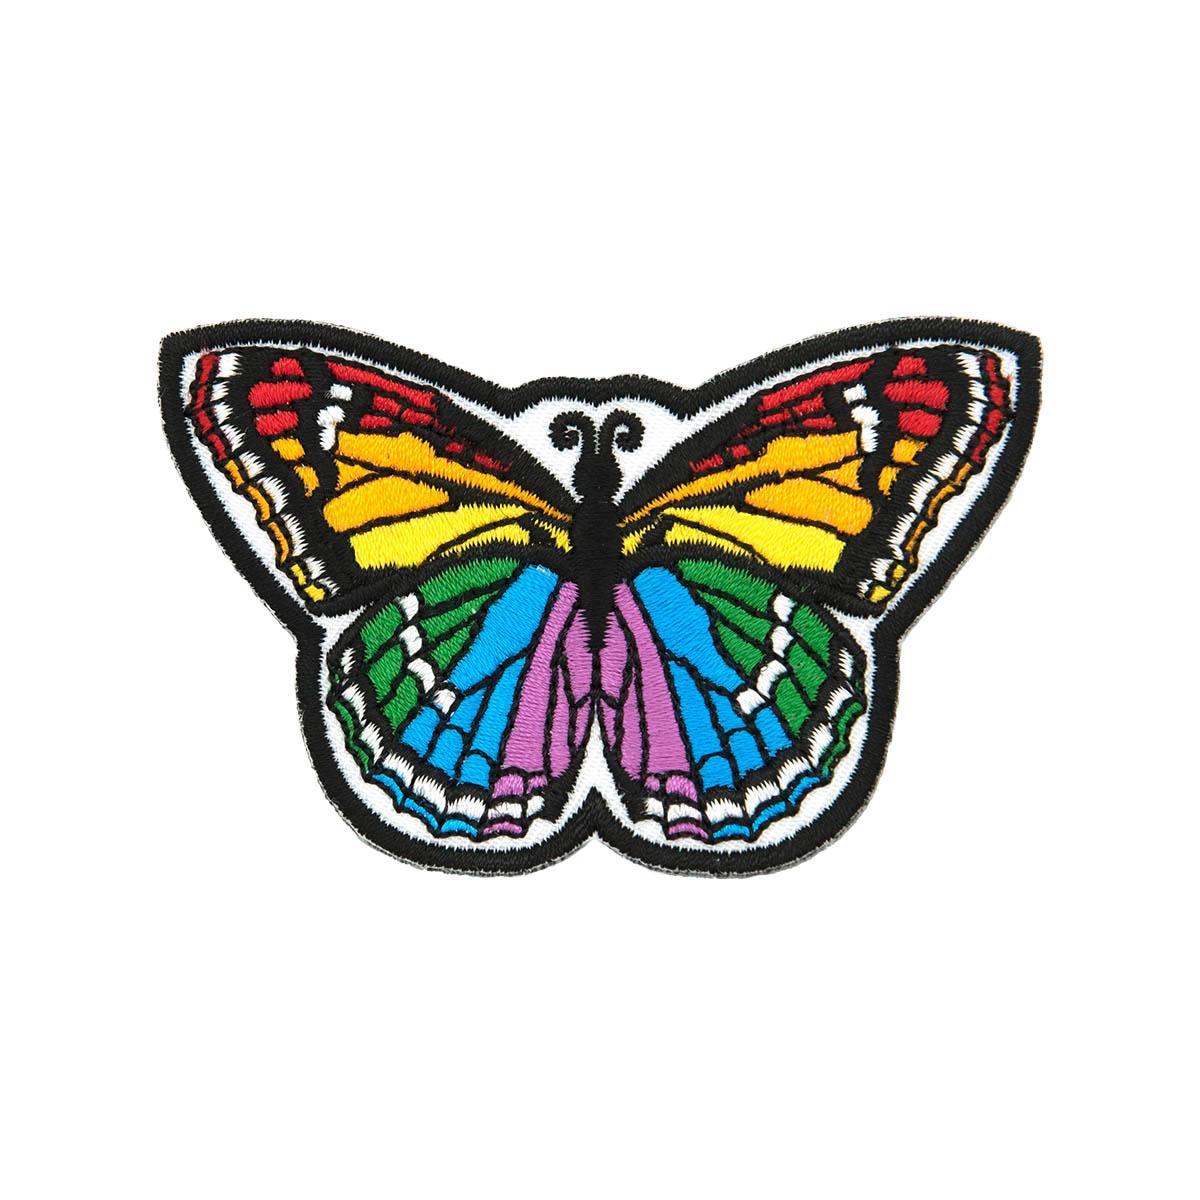 AD1346 Термоаппликация 'Бабочка', Hobby&Pro